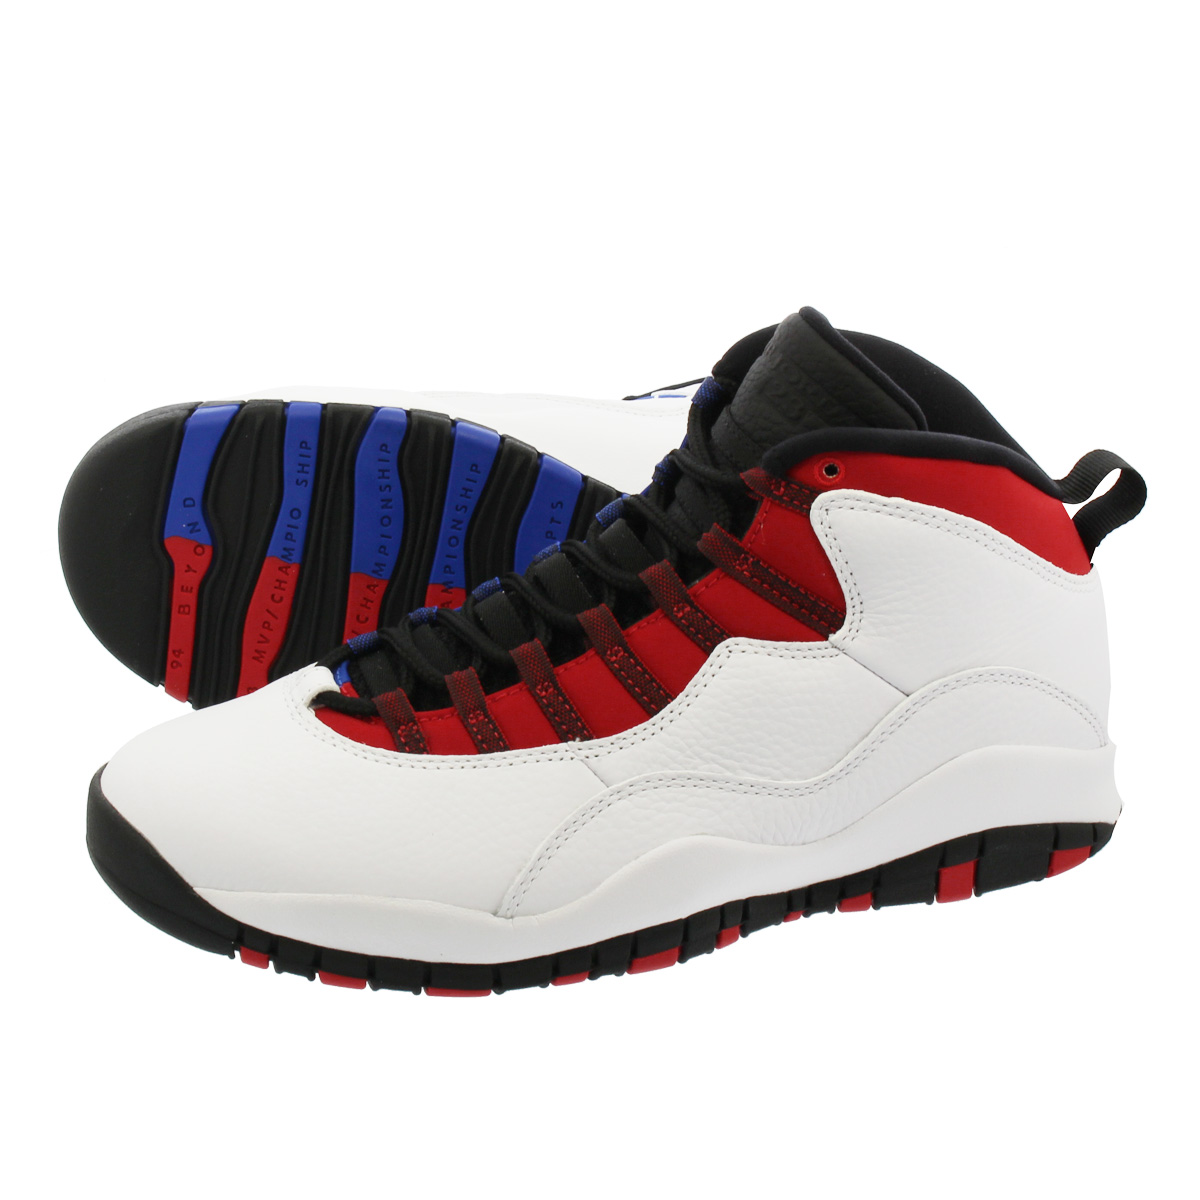 purchase cheap 85fe9 94168 NIKE AIR JORDAN 10 RETRO Nike Air Jordan 10 nostalgic  WHITE/BLACK/UNIVERSITY RED/HYPER ROYAL 310,805-160